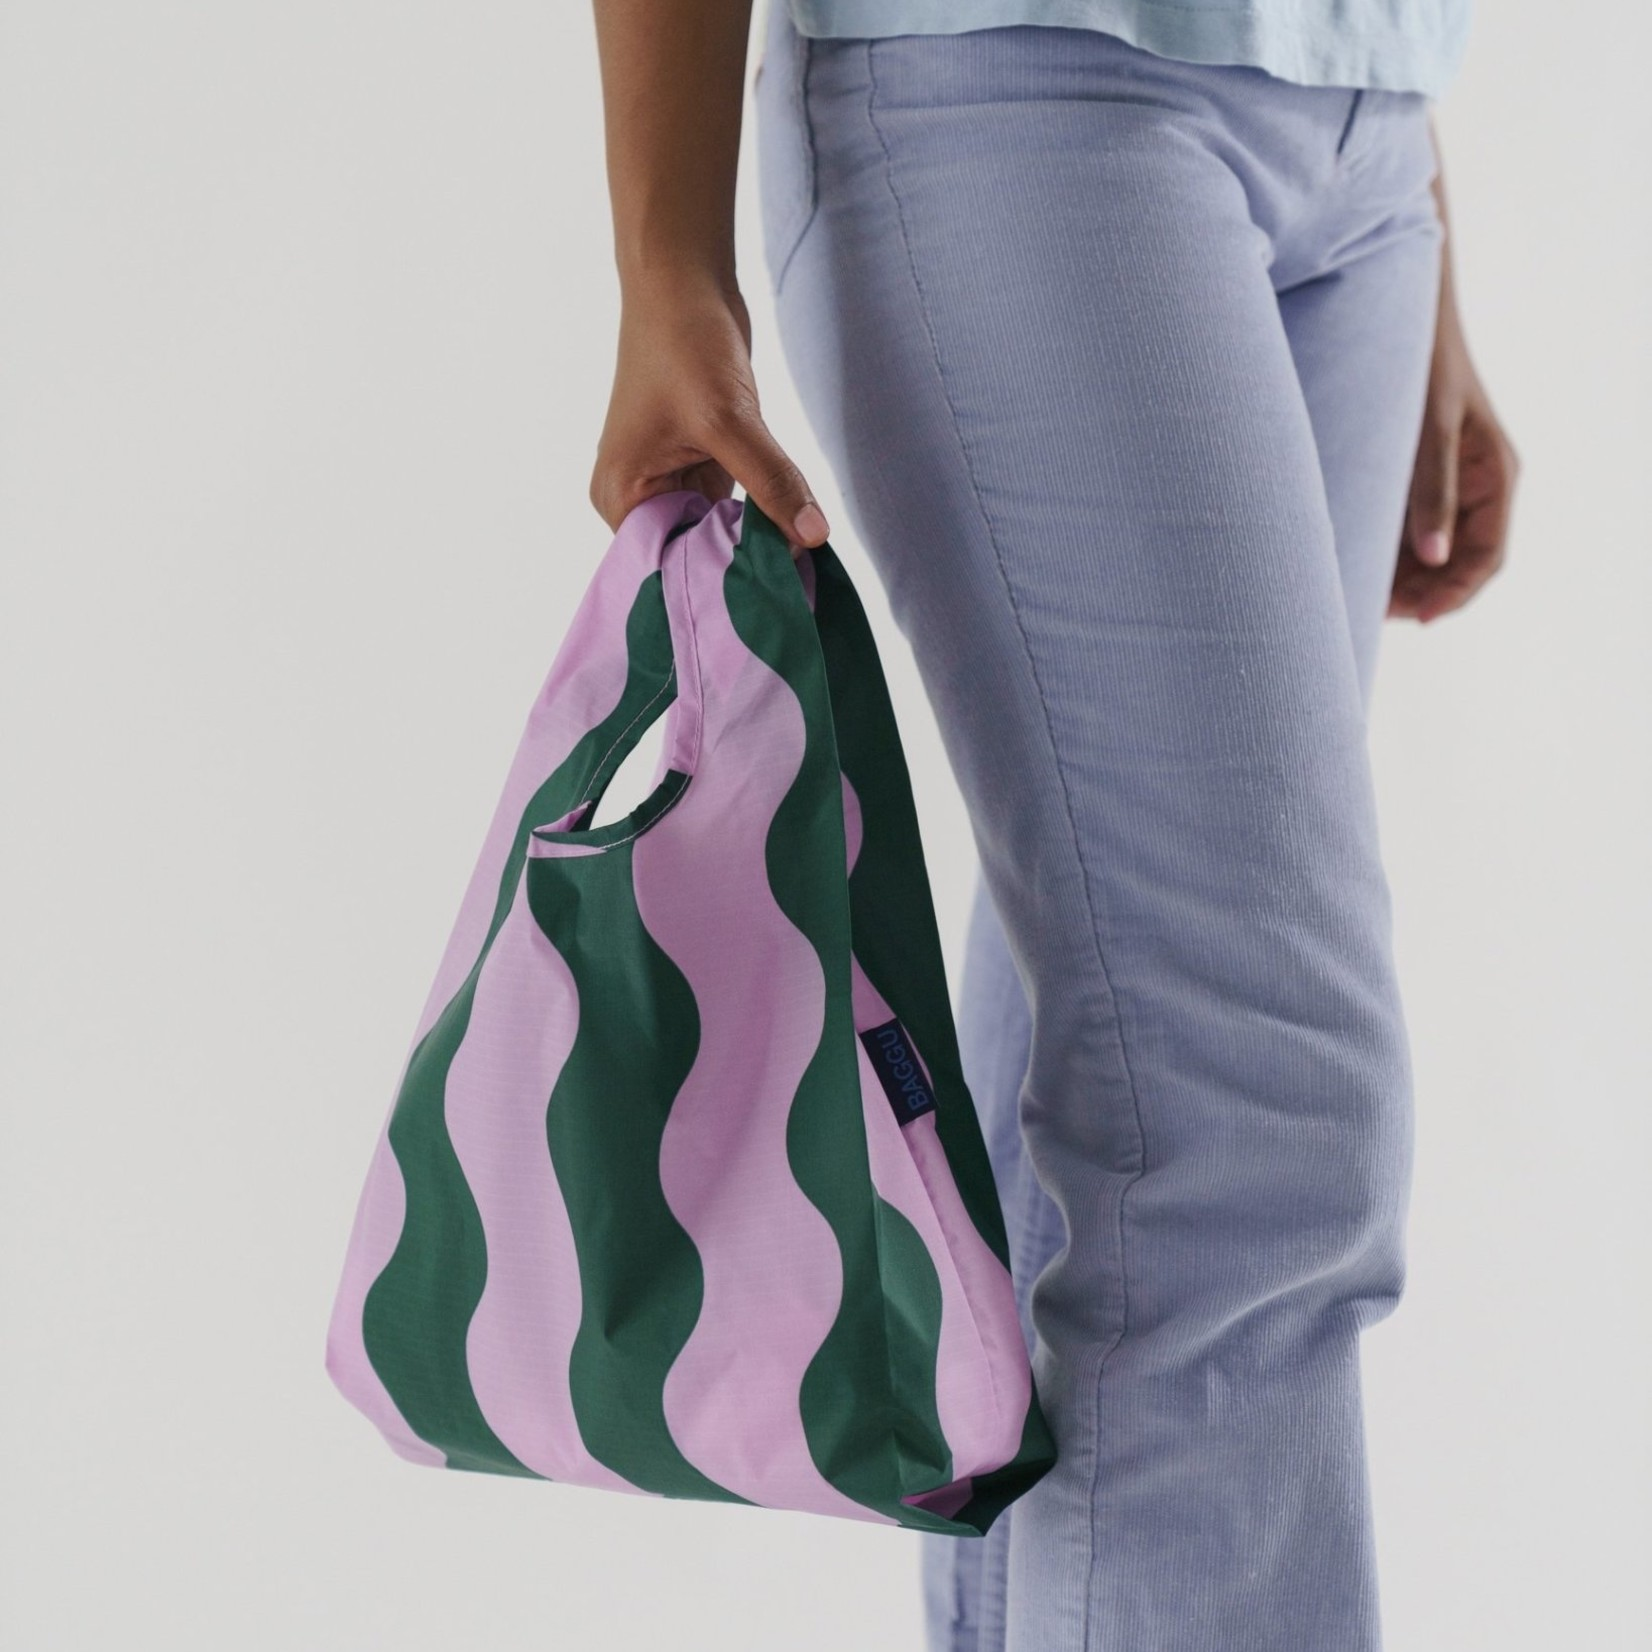 Baggu Baggu Reusable Bag Baby Pink and Green Wavy Stripe